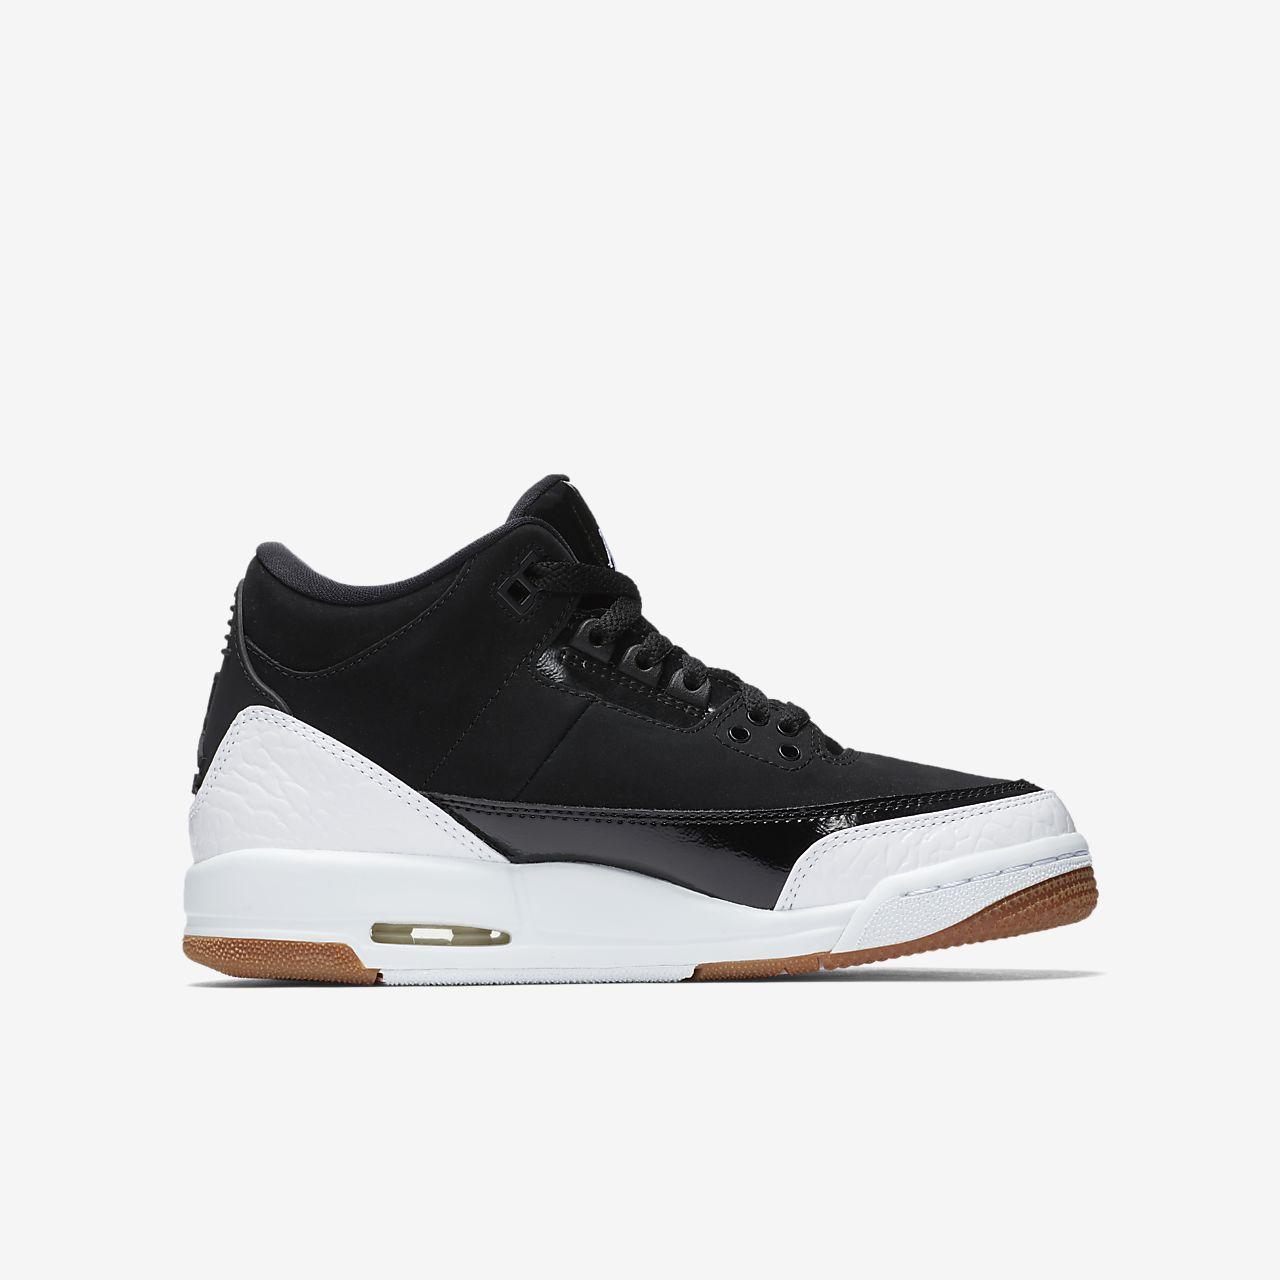 shoes air jordan 3 nz